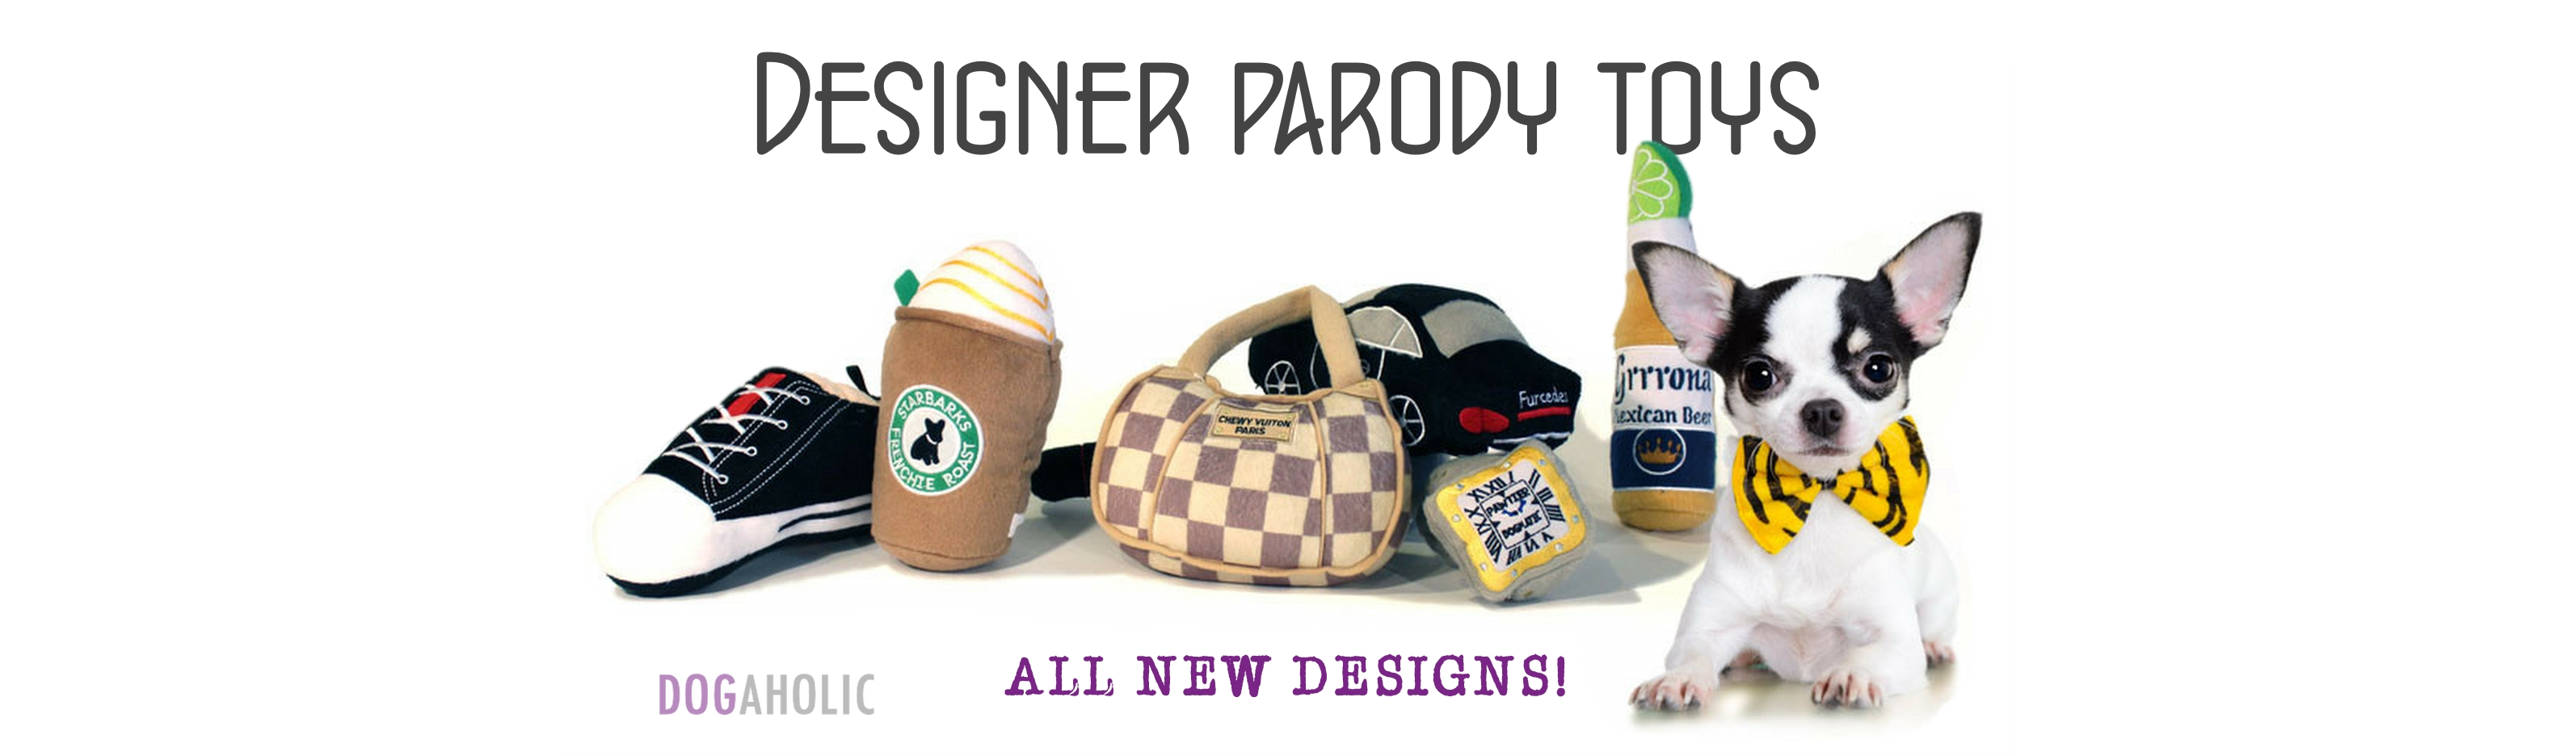 Designer-Parody-Toys-Slider